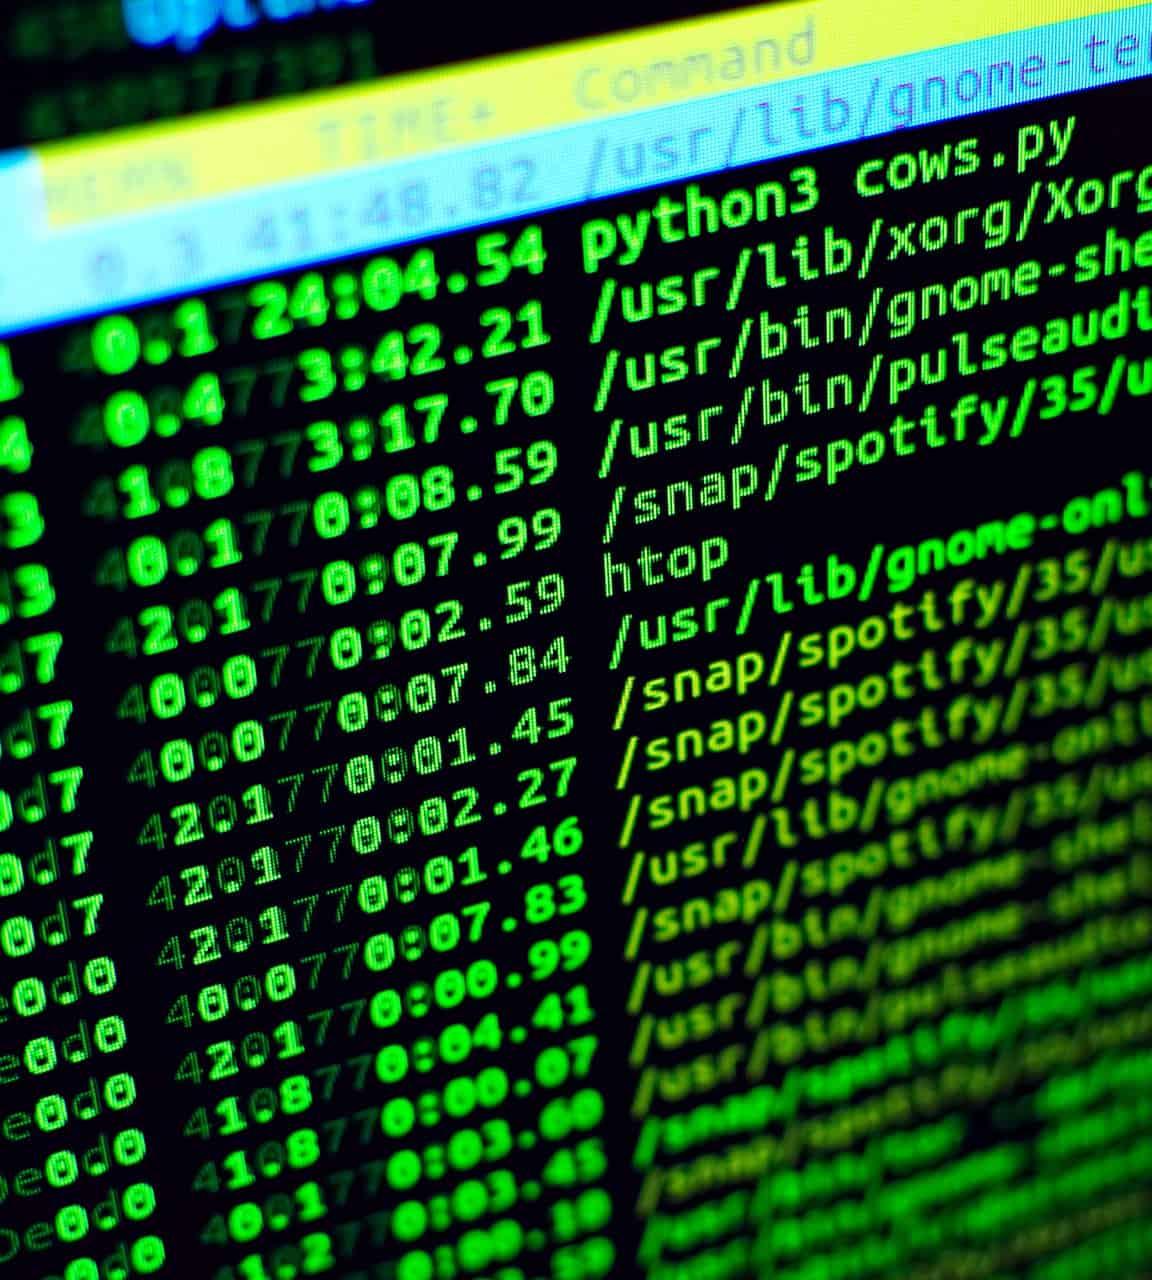 Linux Code Coding Program Computer  - clarkdonald413 / Pixabay